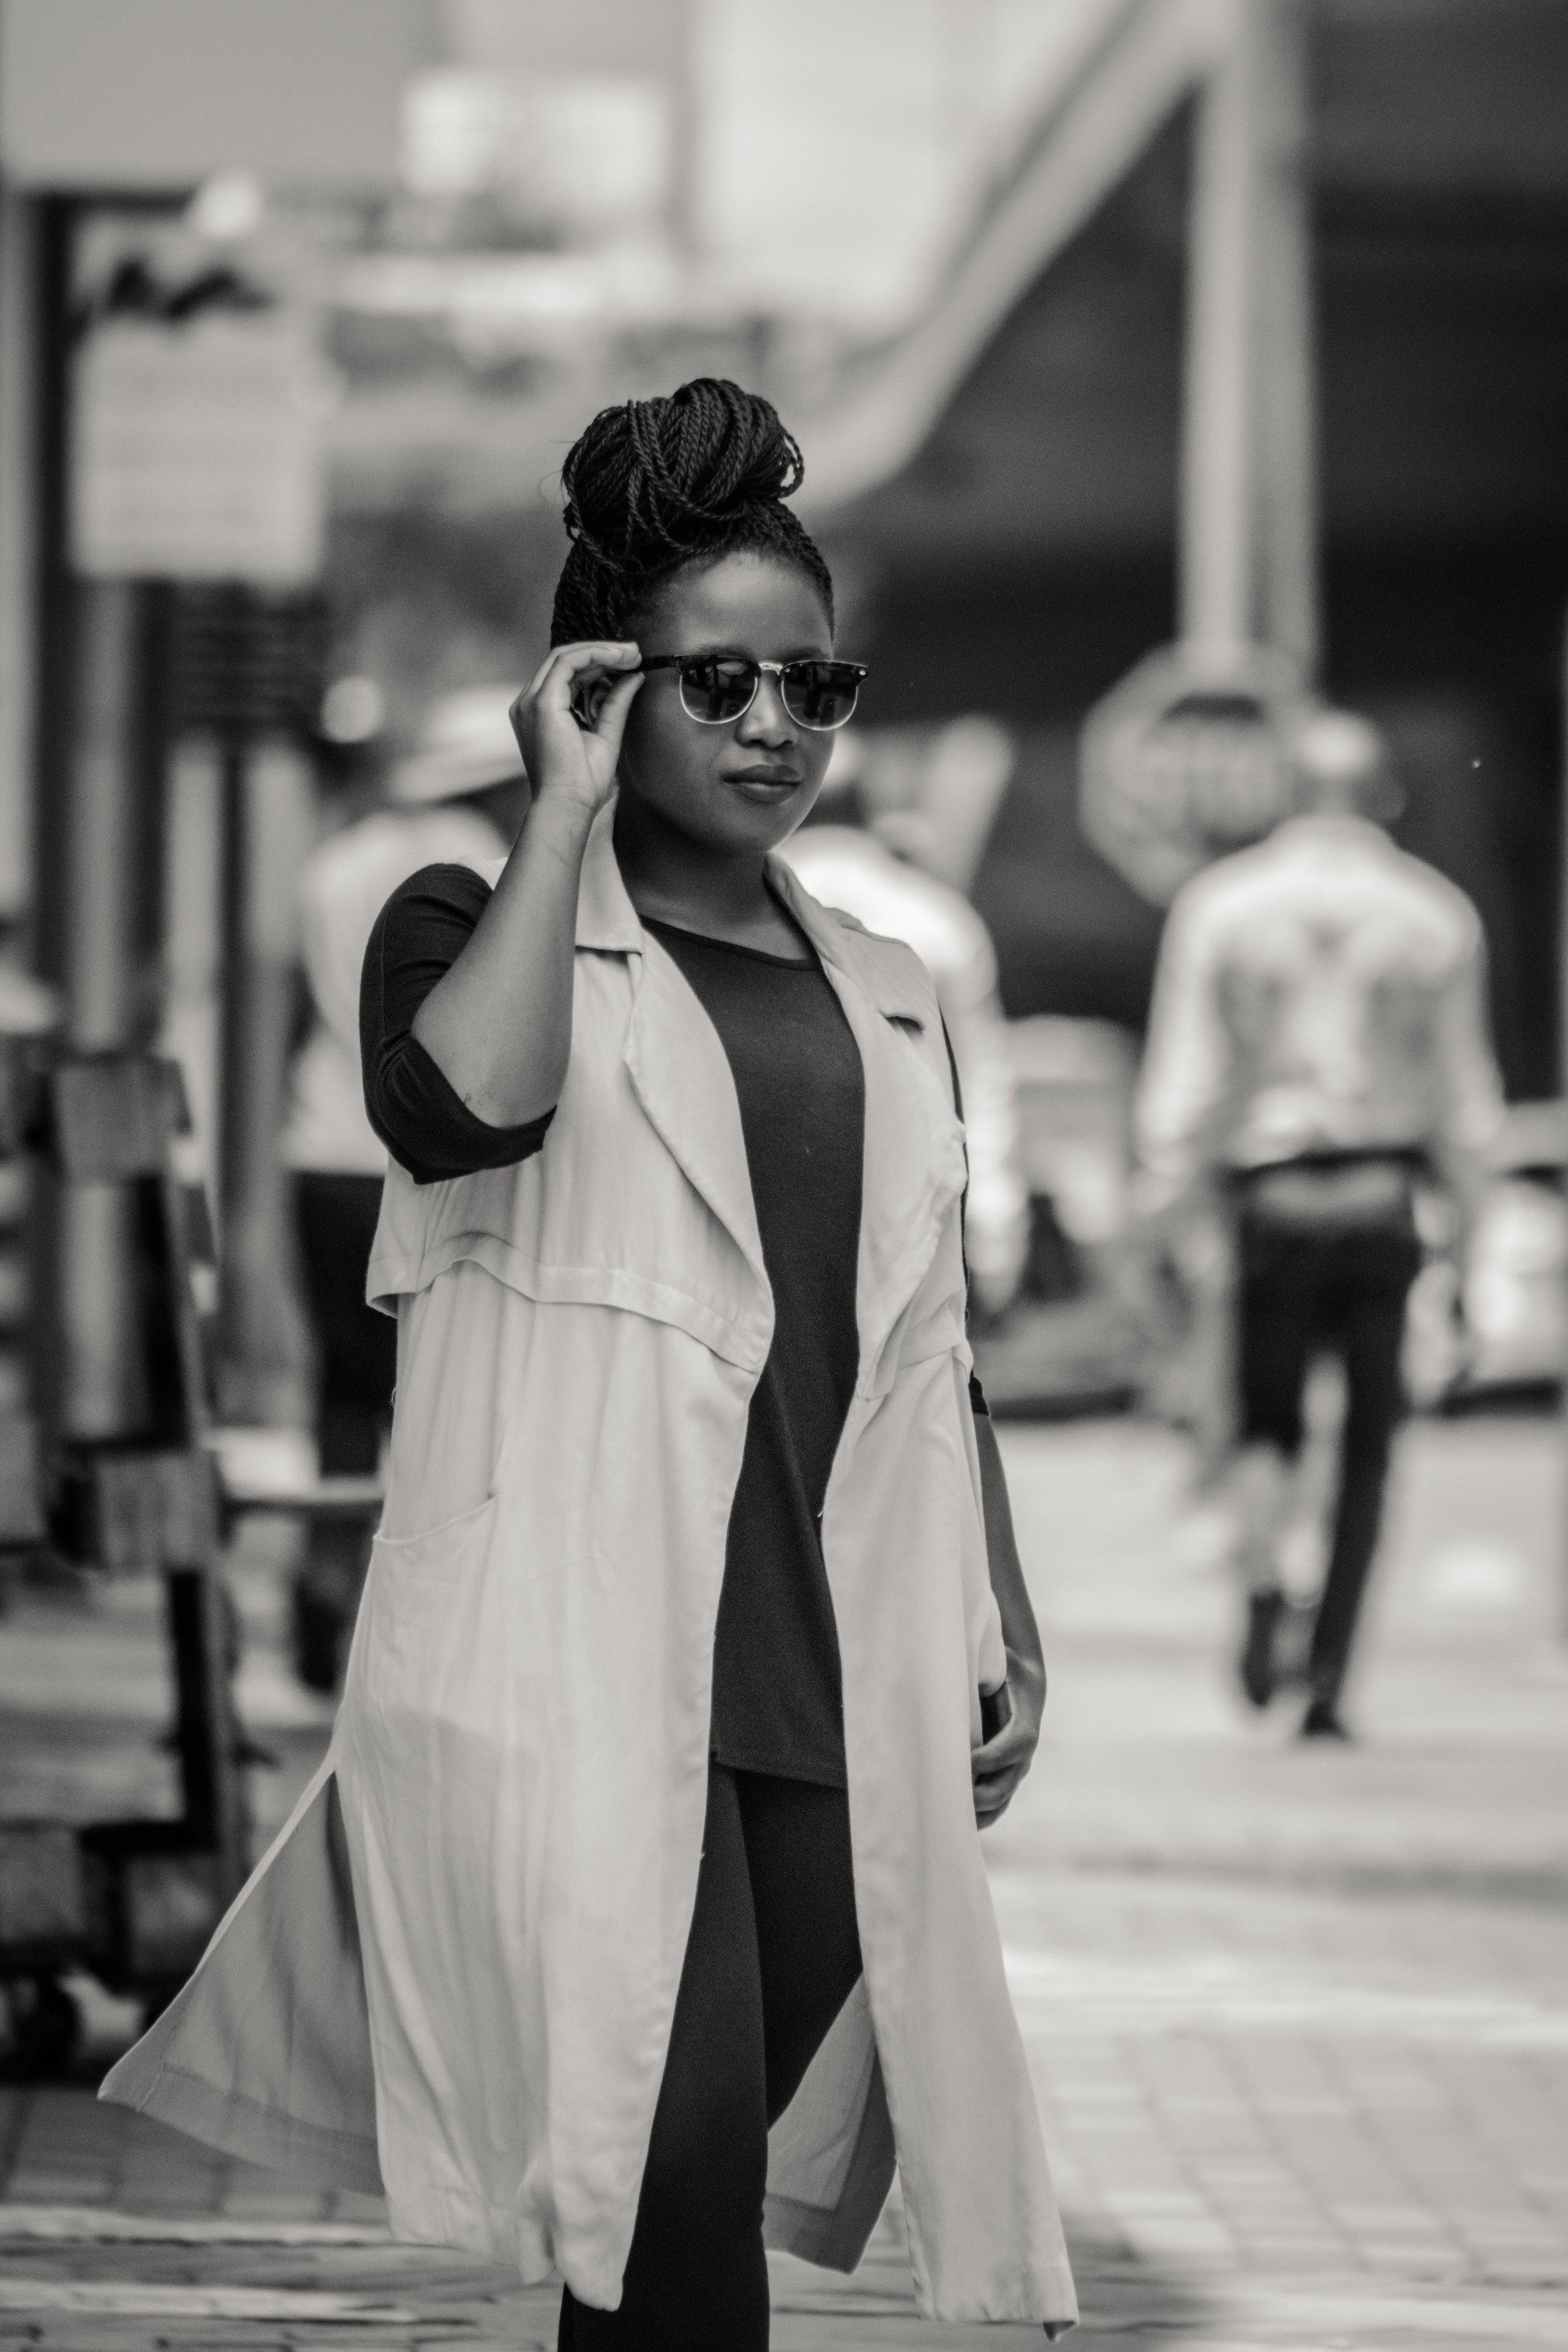 Exploring Johannesburg